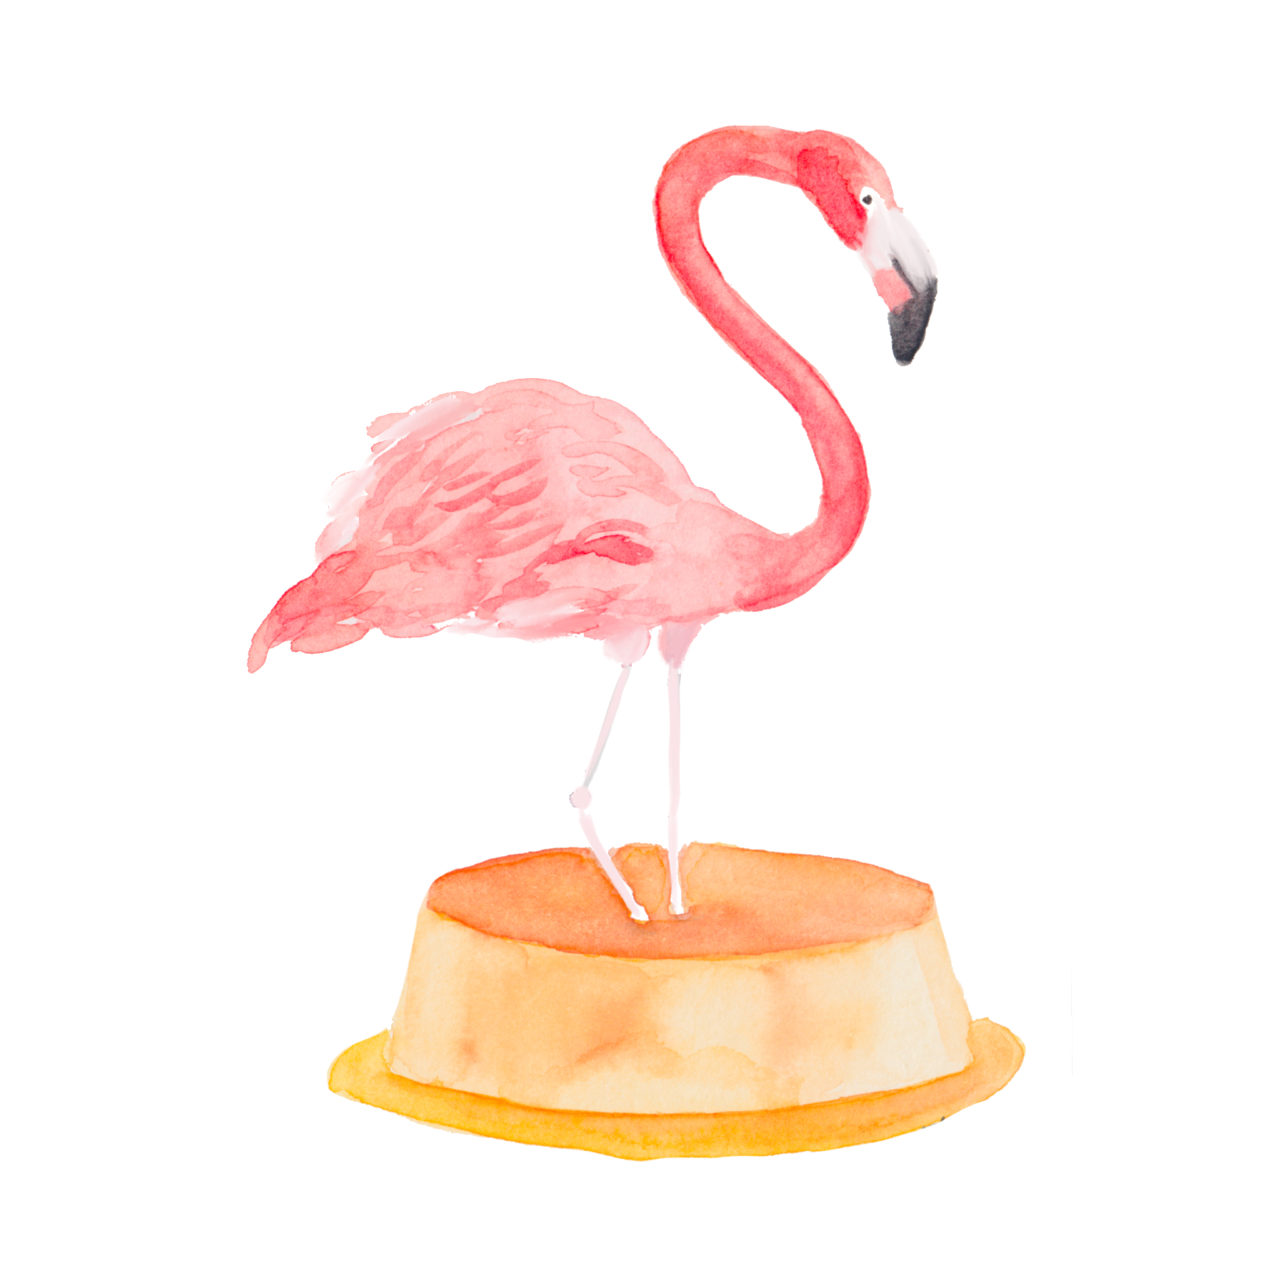 watercolor flamingo on a flan